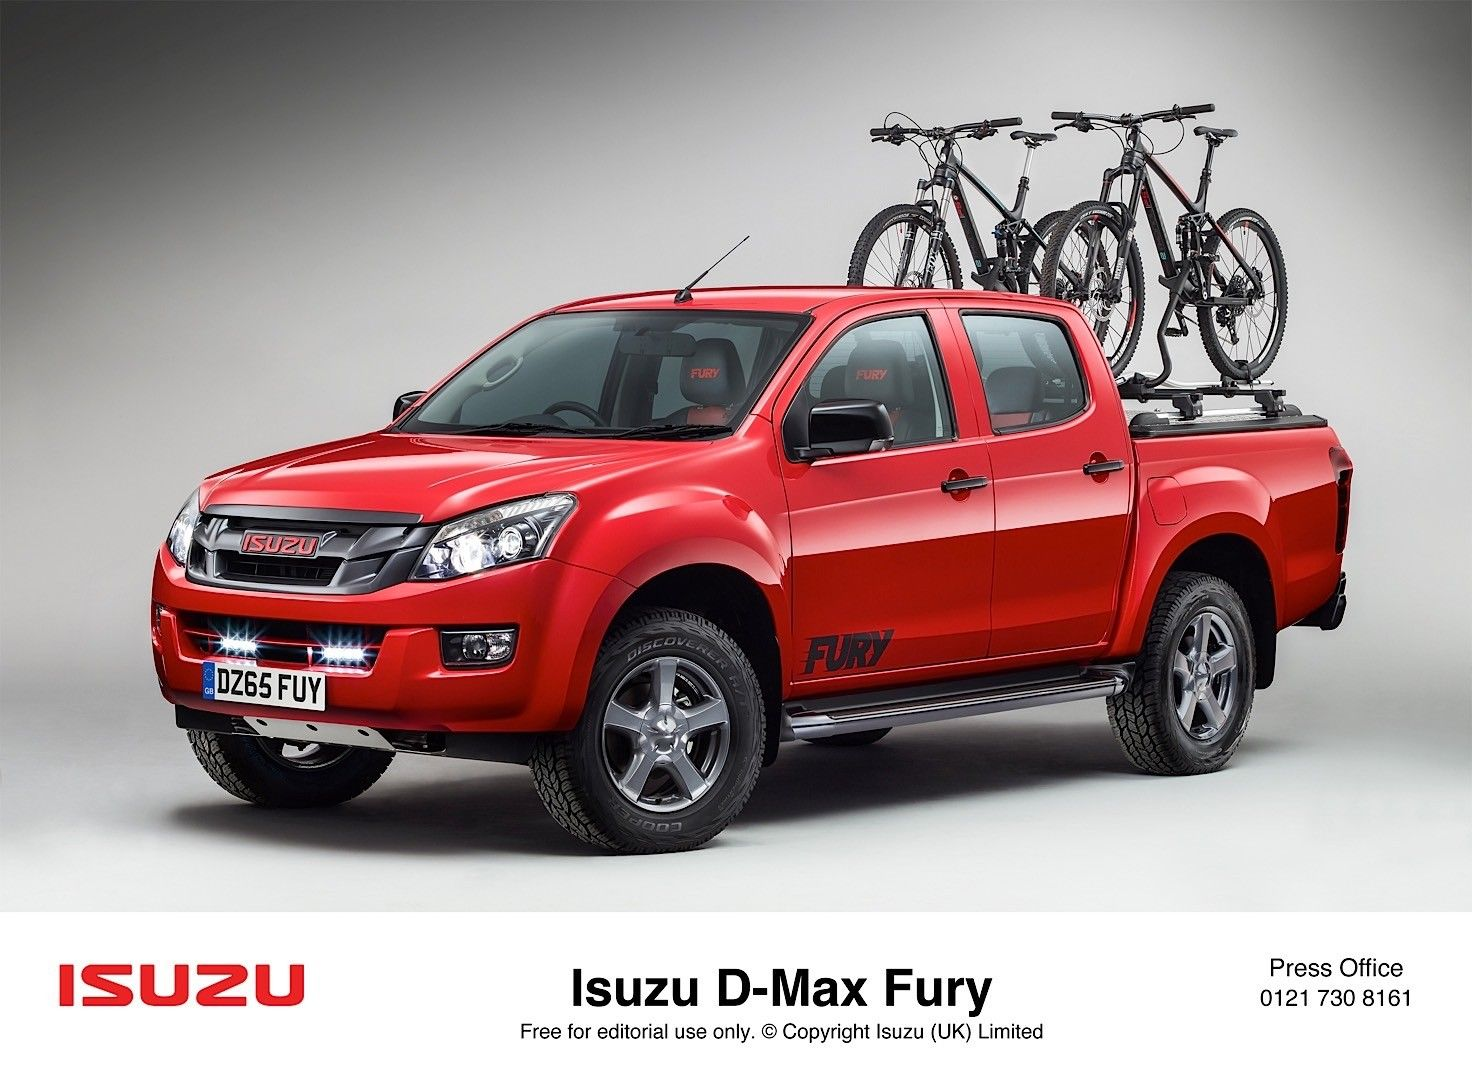 Isuzu DMax Range Adds Fury Variant, Has Nothing To do